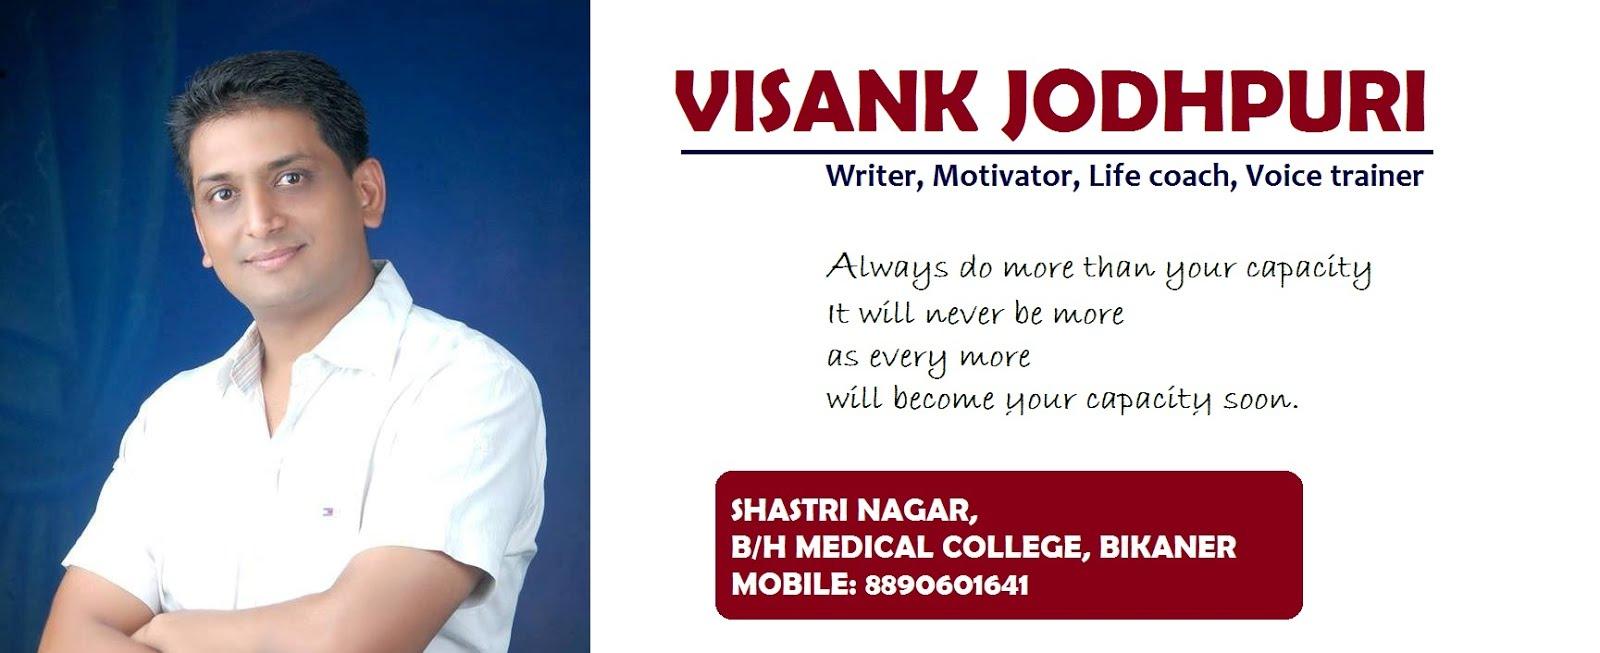 Visank Jodhpuri - Writer & Motivator